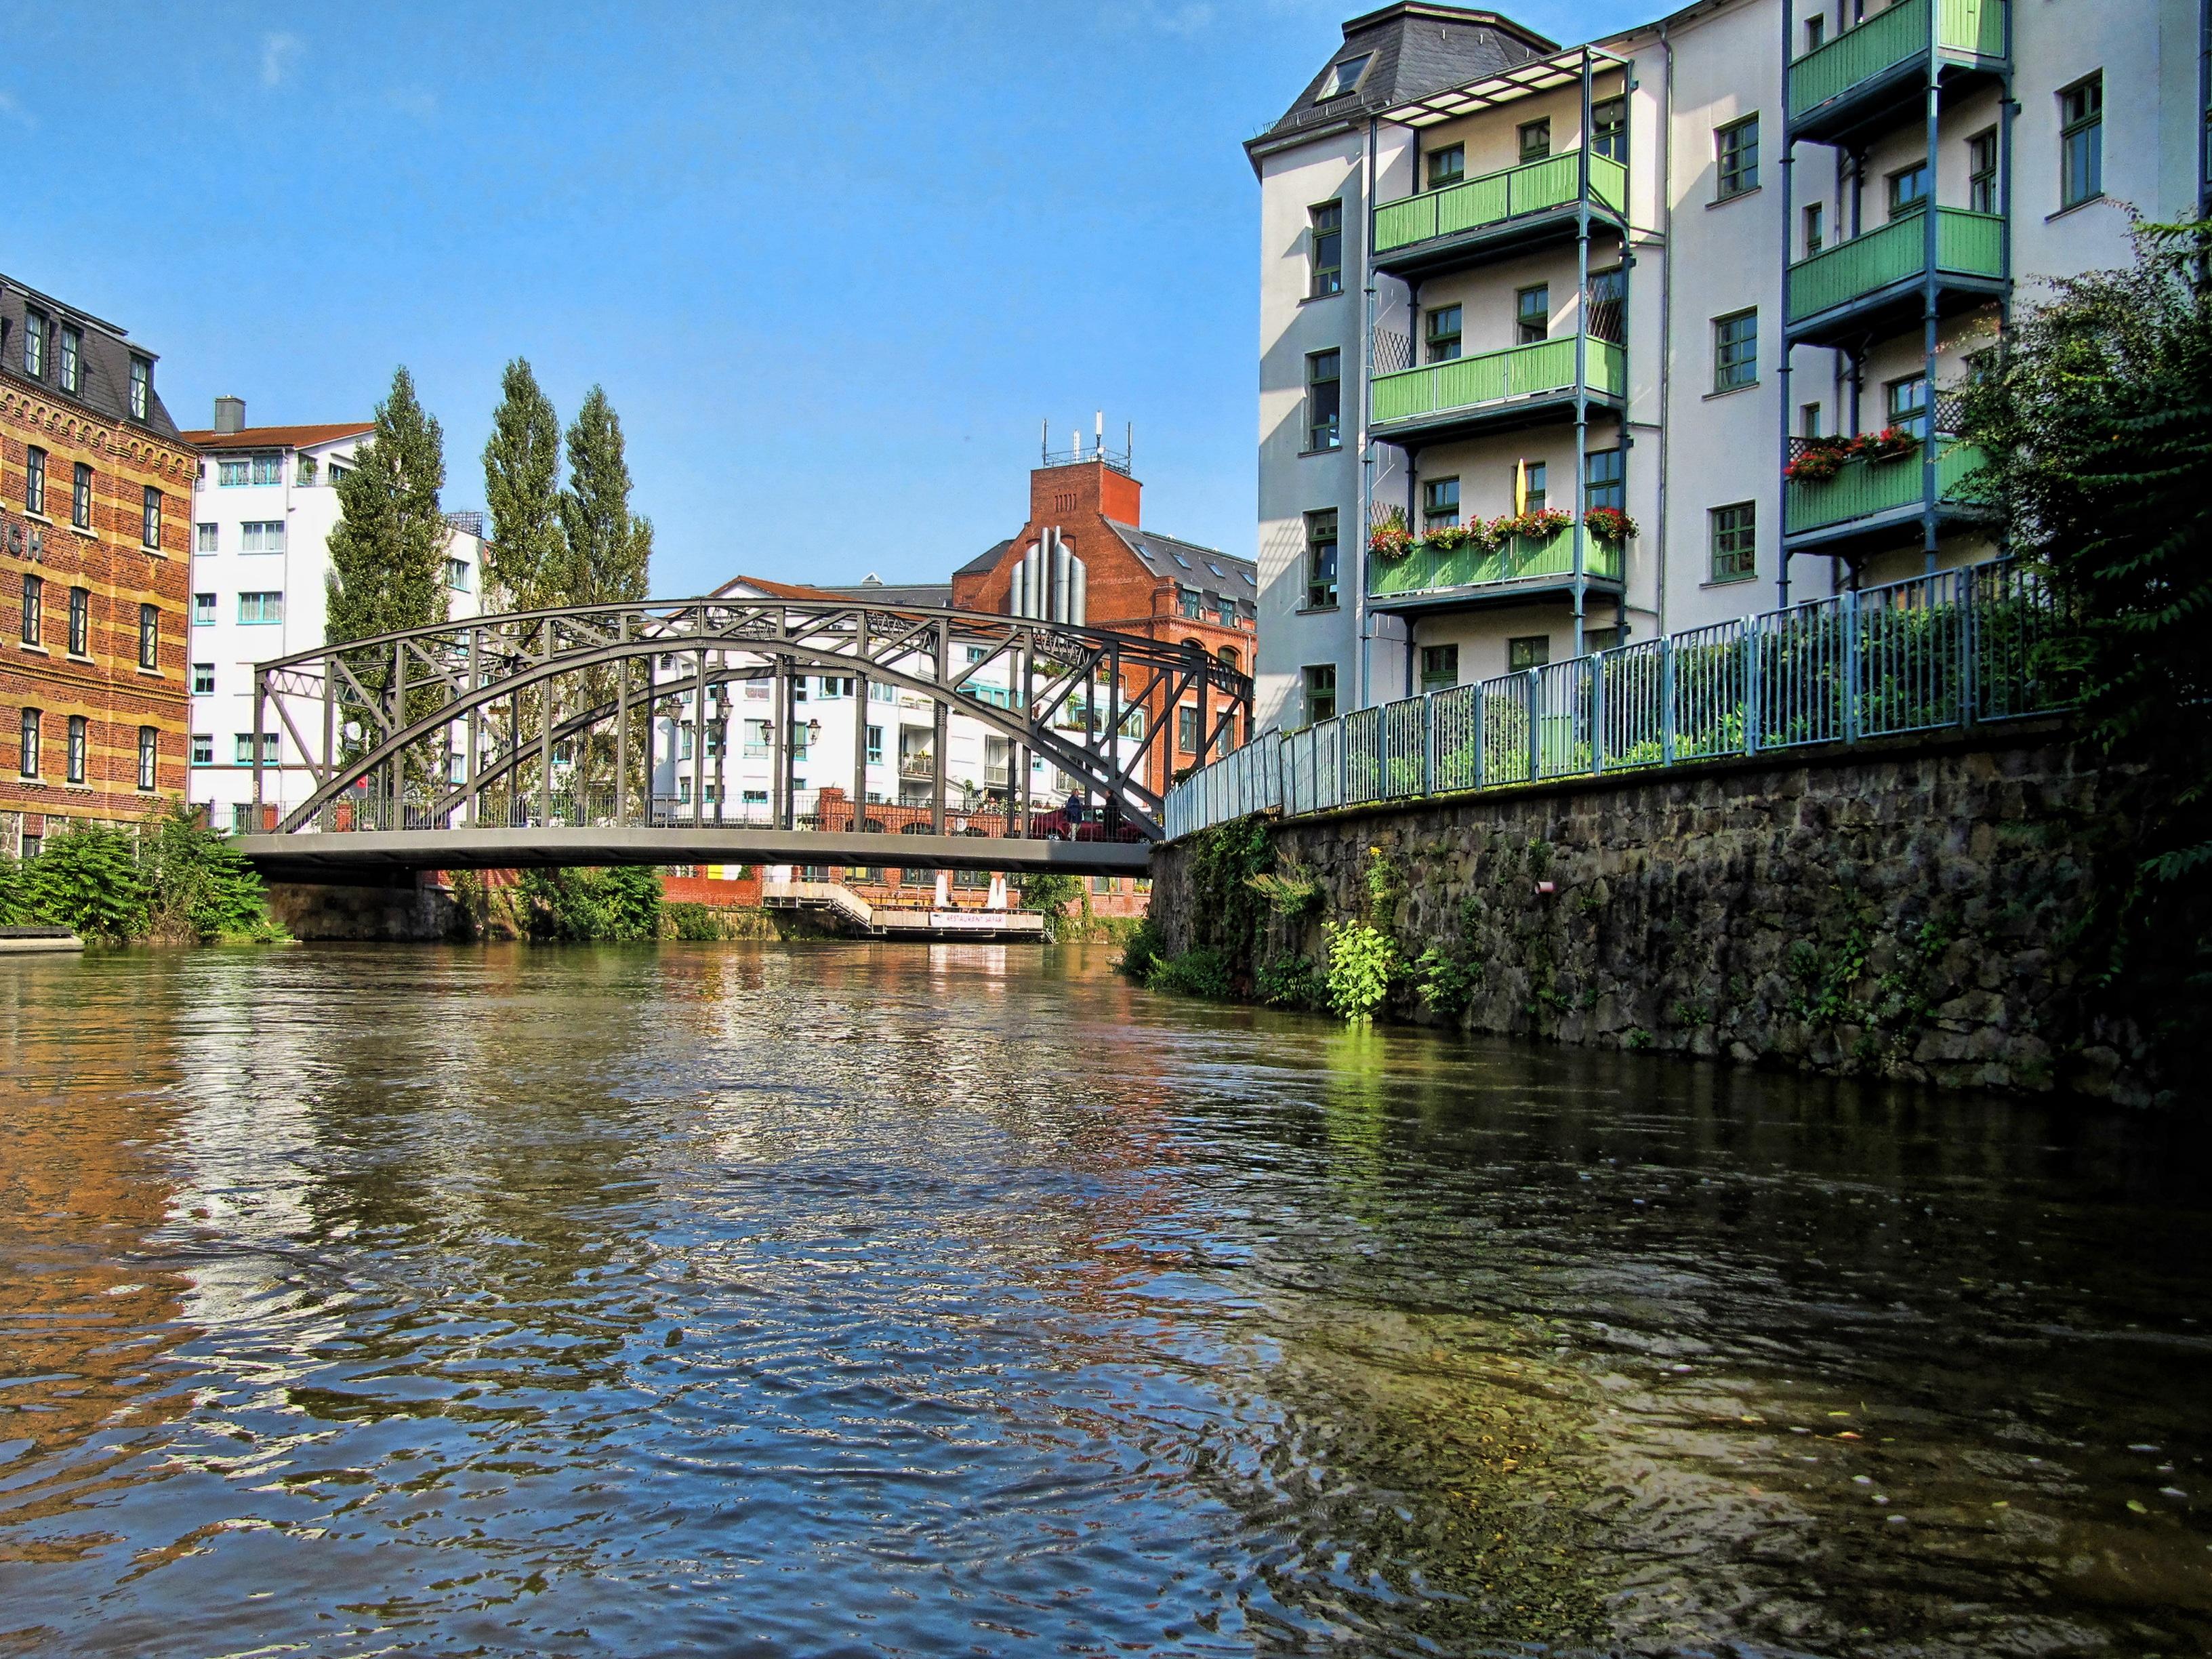 Leipzig Fluss kostenlose foto wasser brücke stadt zuhause fluss kanal